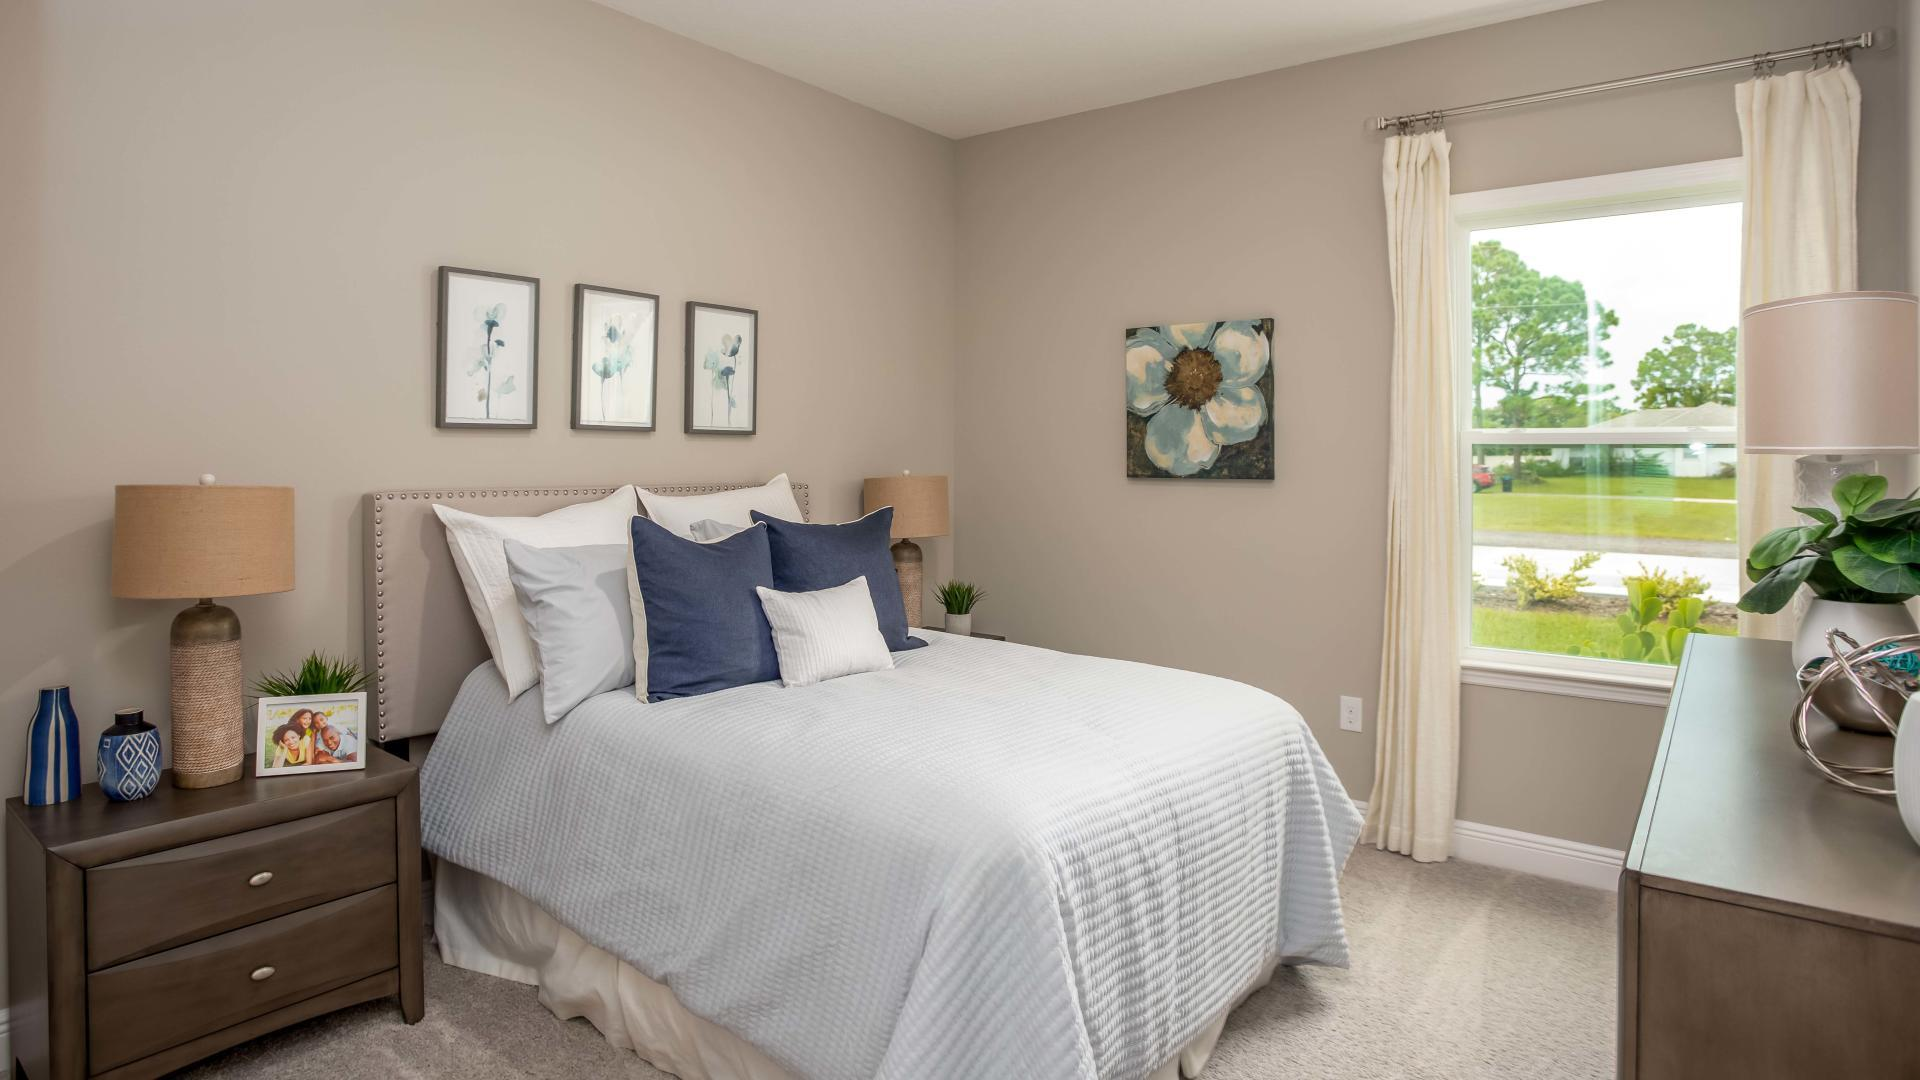 Bedroom featured in the Harmony By Maronda Homes in Daytona Beach, FL